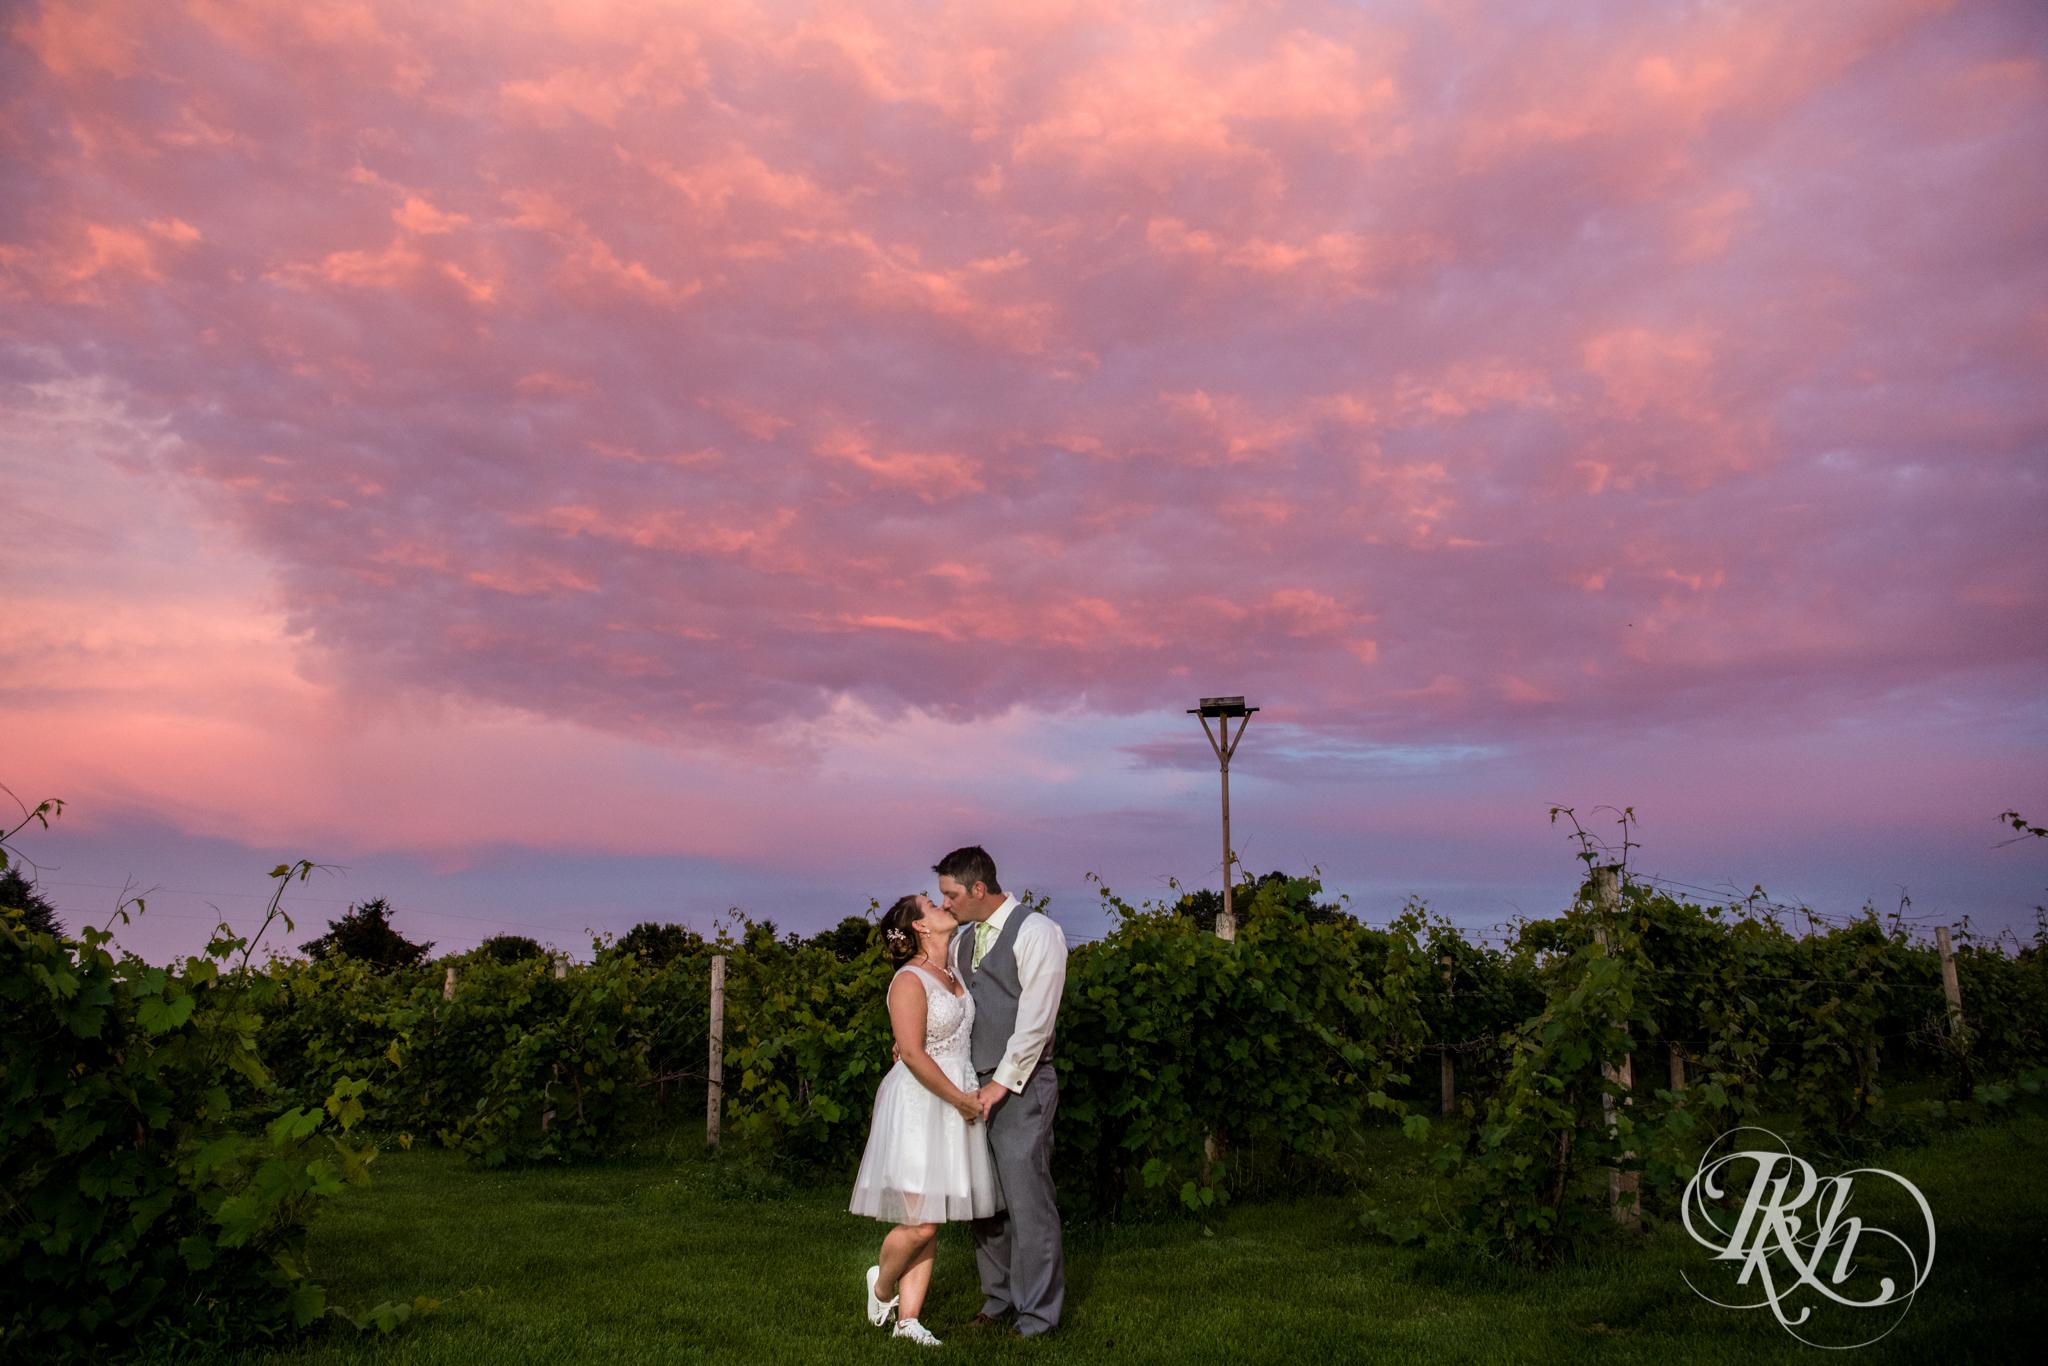 Ally & Nick - Minnesota Wedding Photography - Next Chapter Winery - RKH Images - Blog (54 of 57).jpg